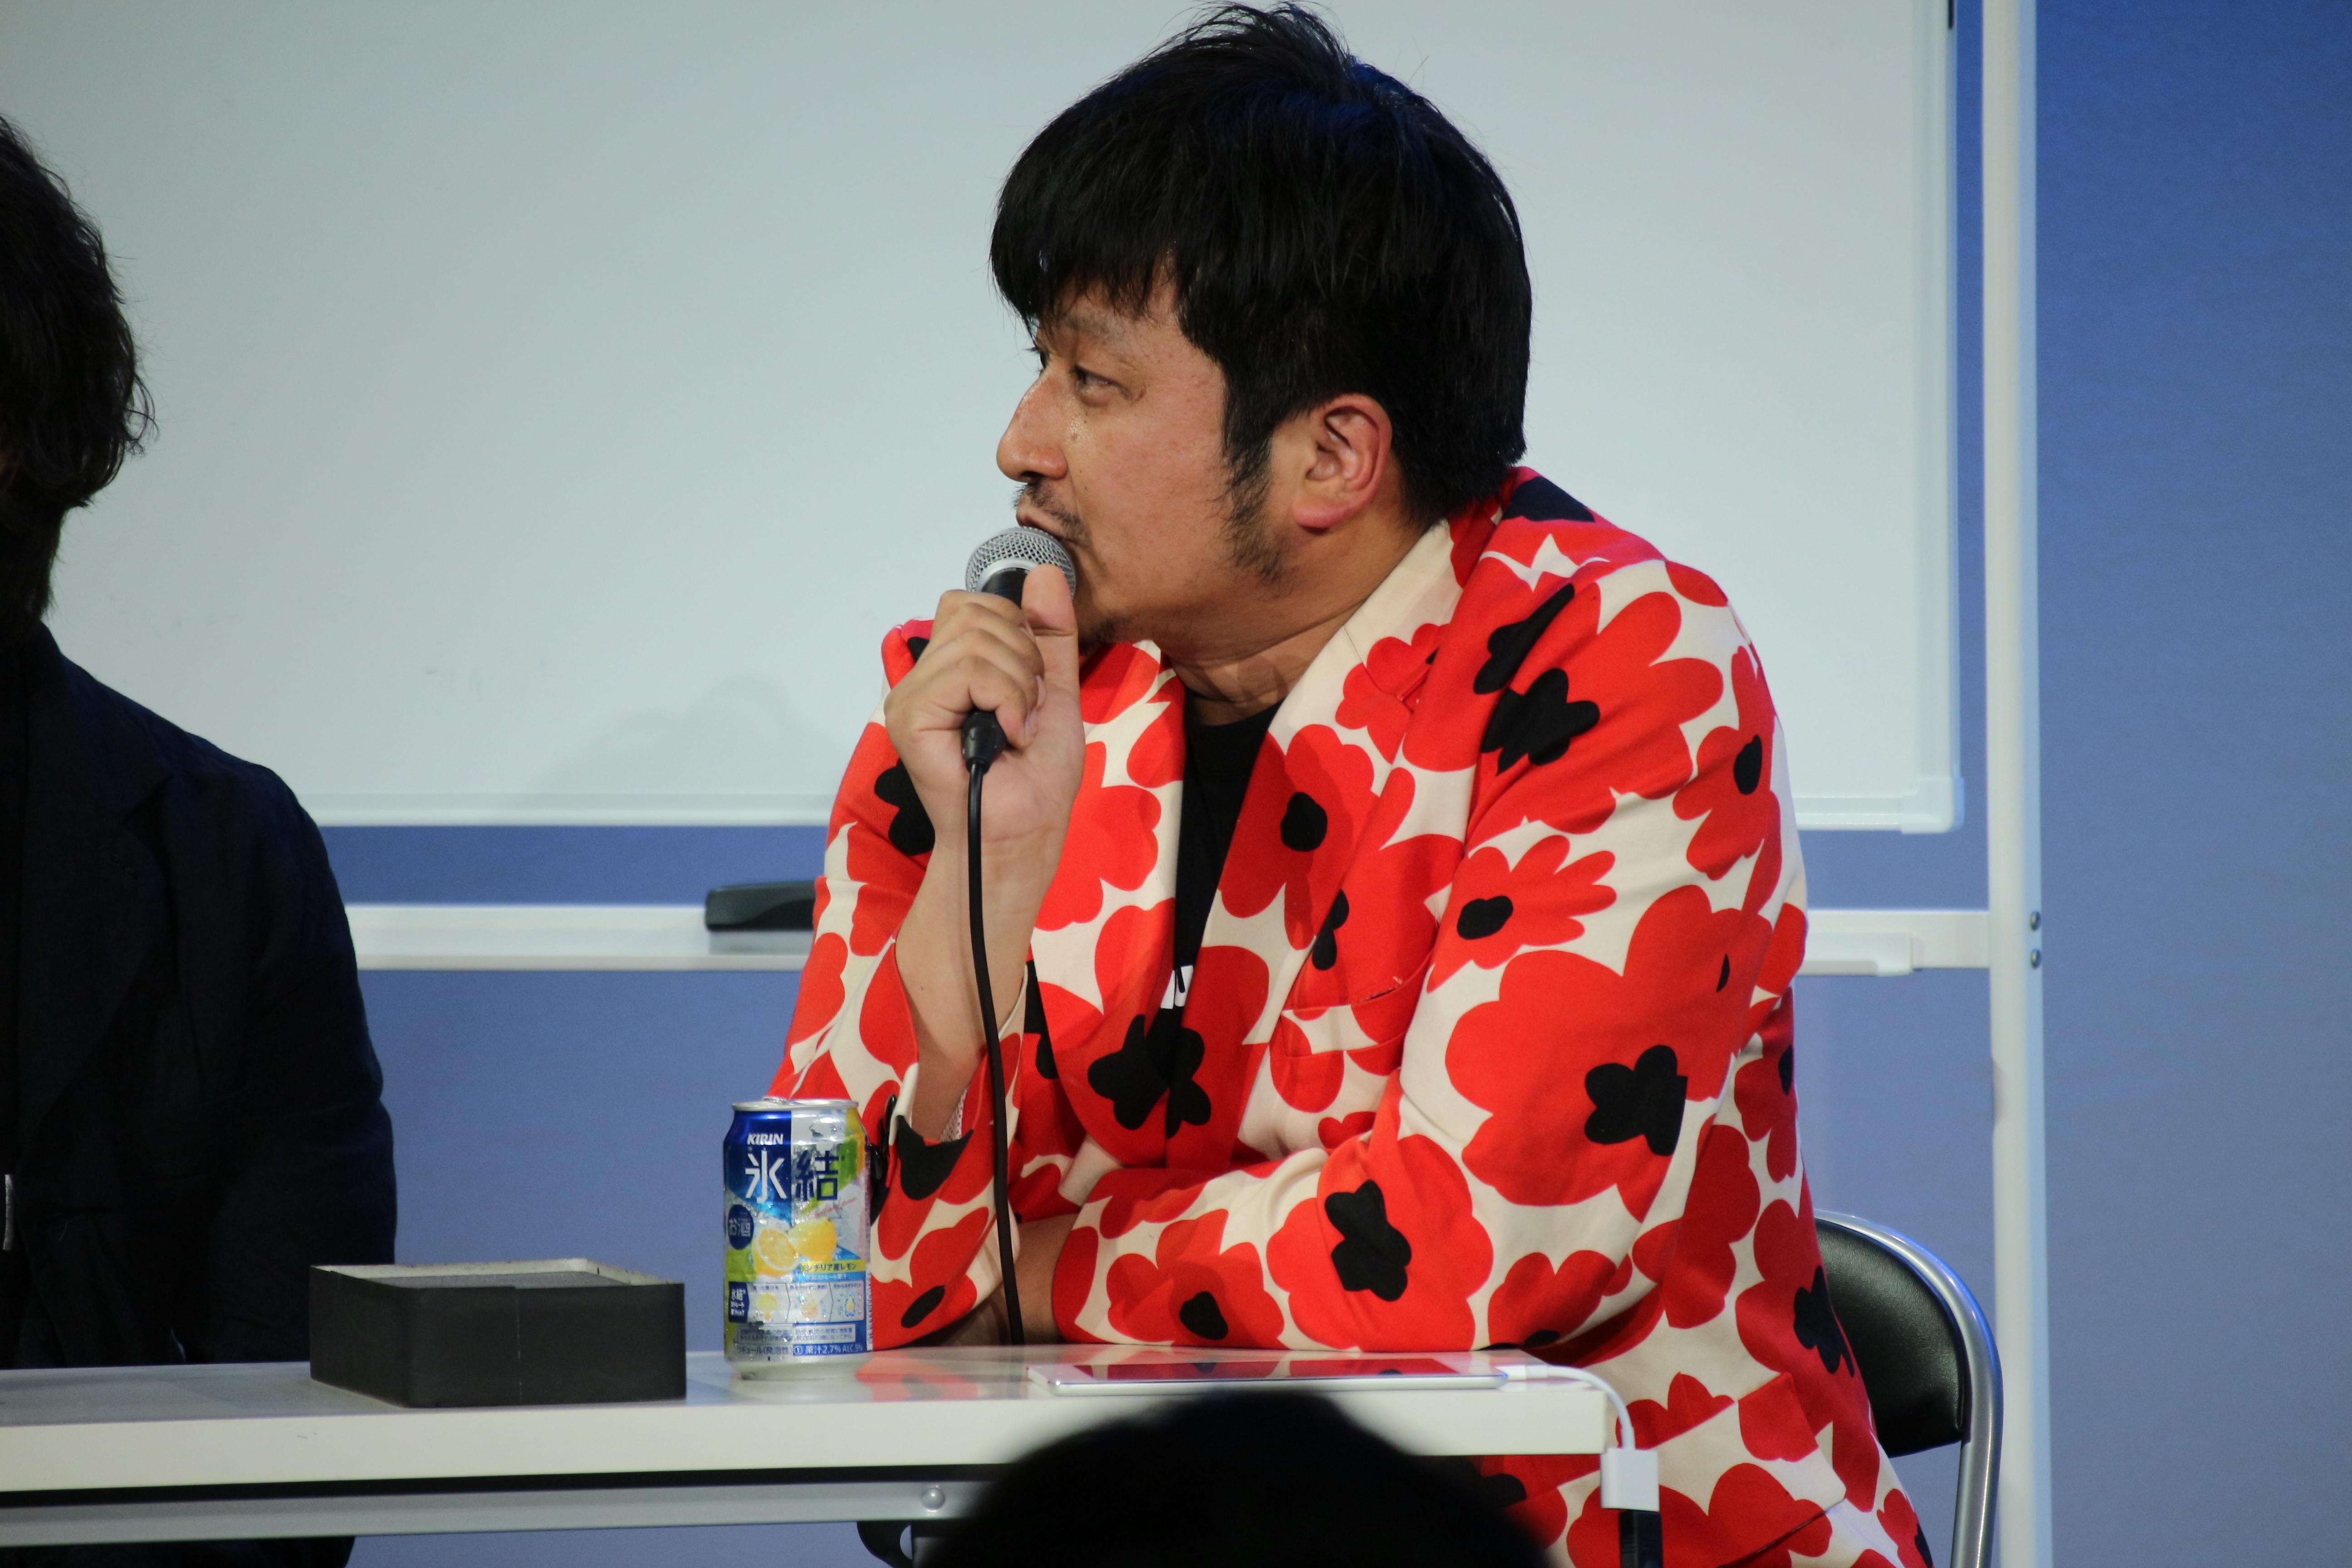 http://news.yoshimoto.co.jp/20180512231939-844b9e396ff18d7ce7e0ea23e72ce914a5edcde4.jpg